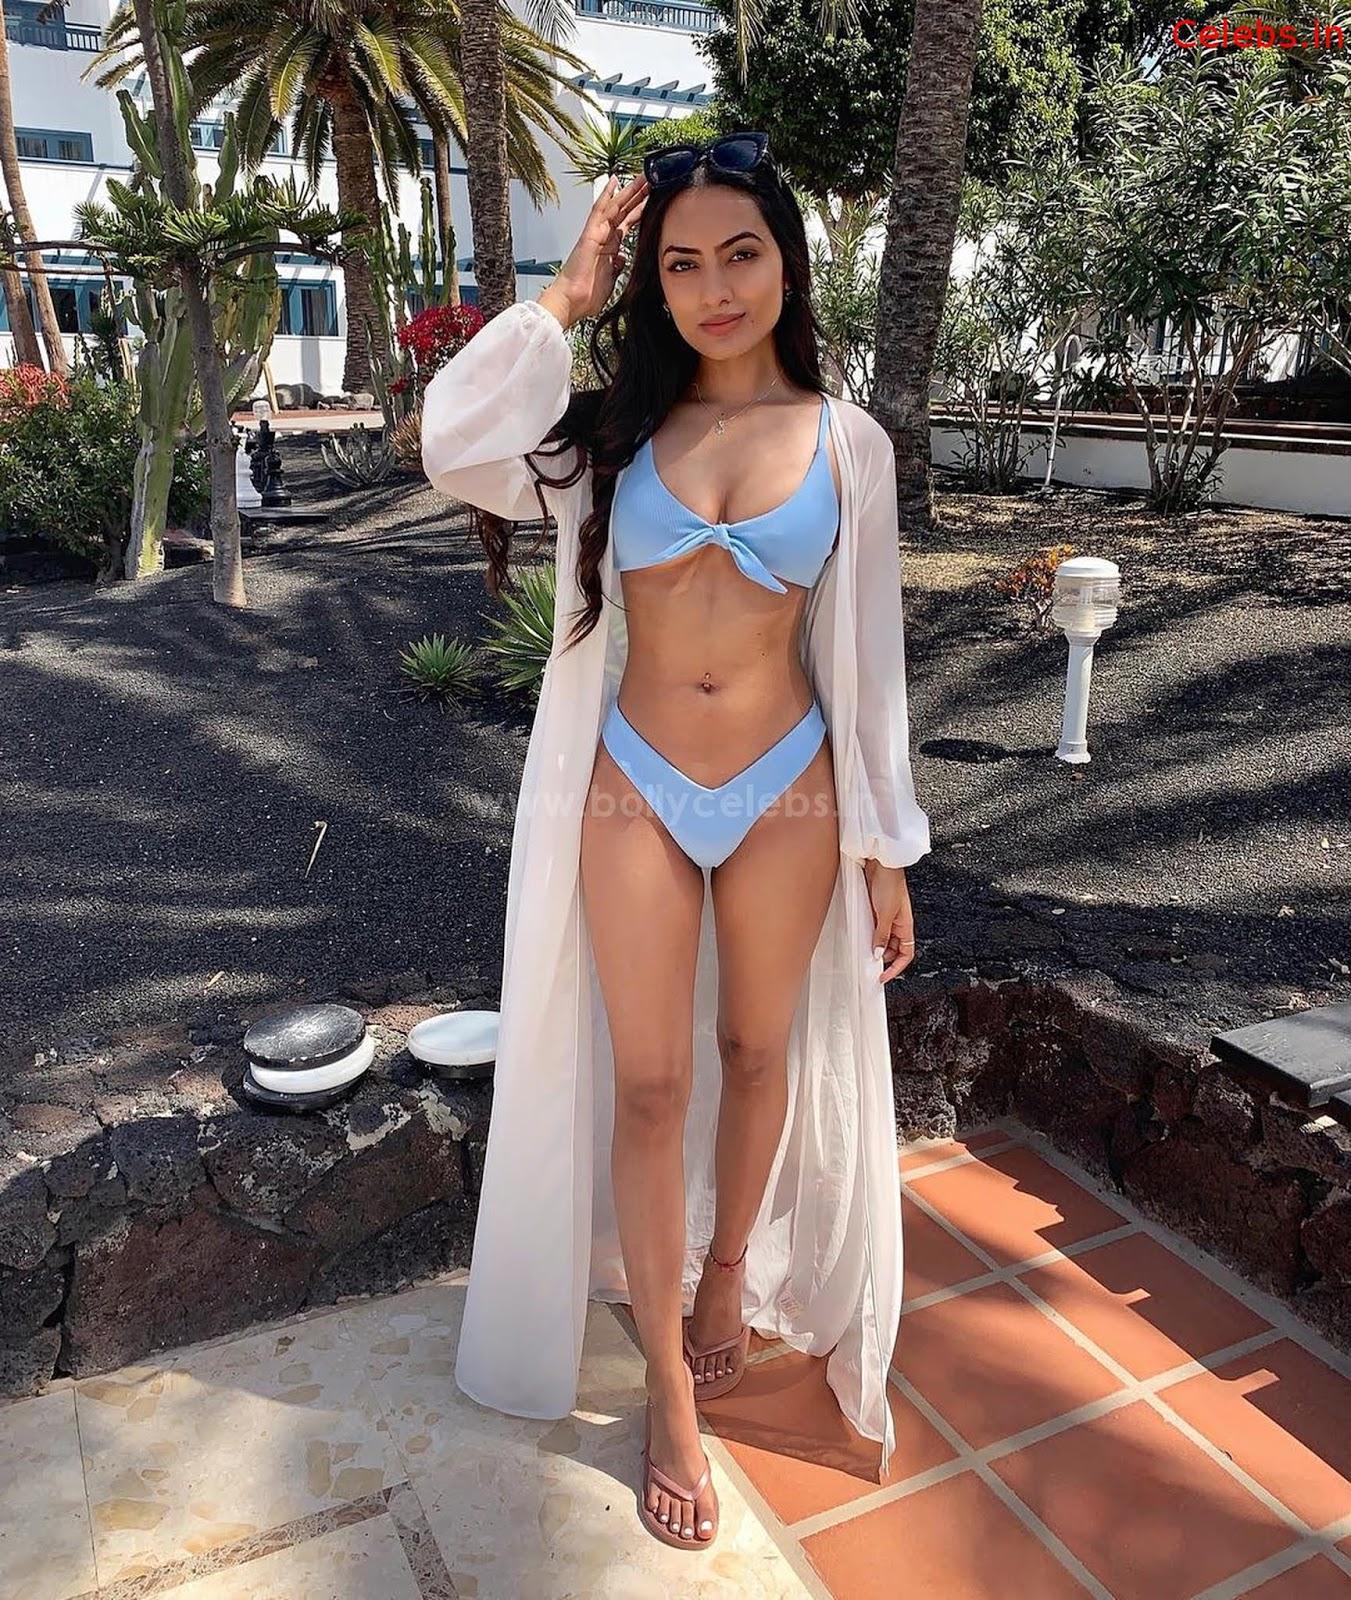 Nikki Rai - Beautiful Indian Model Stunning Gallery Collection in Lingerie Bikini 2019-18 ~ bollycelebs.in Exclusive Pics